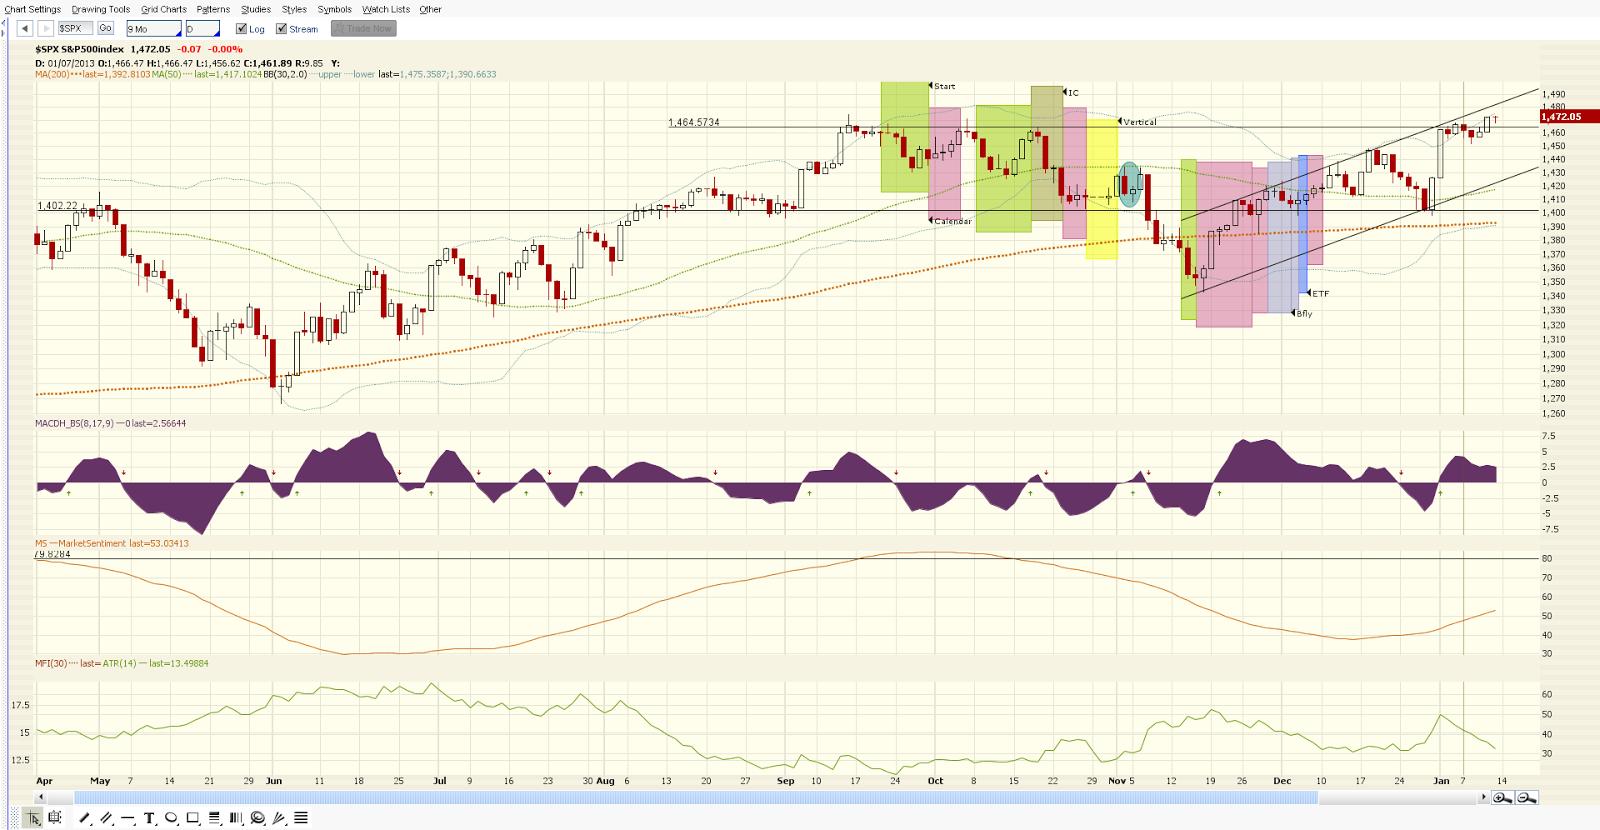 High probability option trading calendar spreads